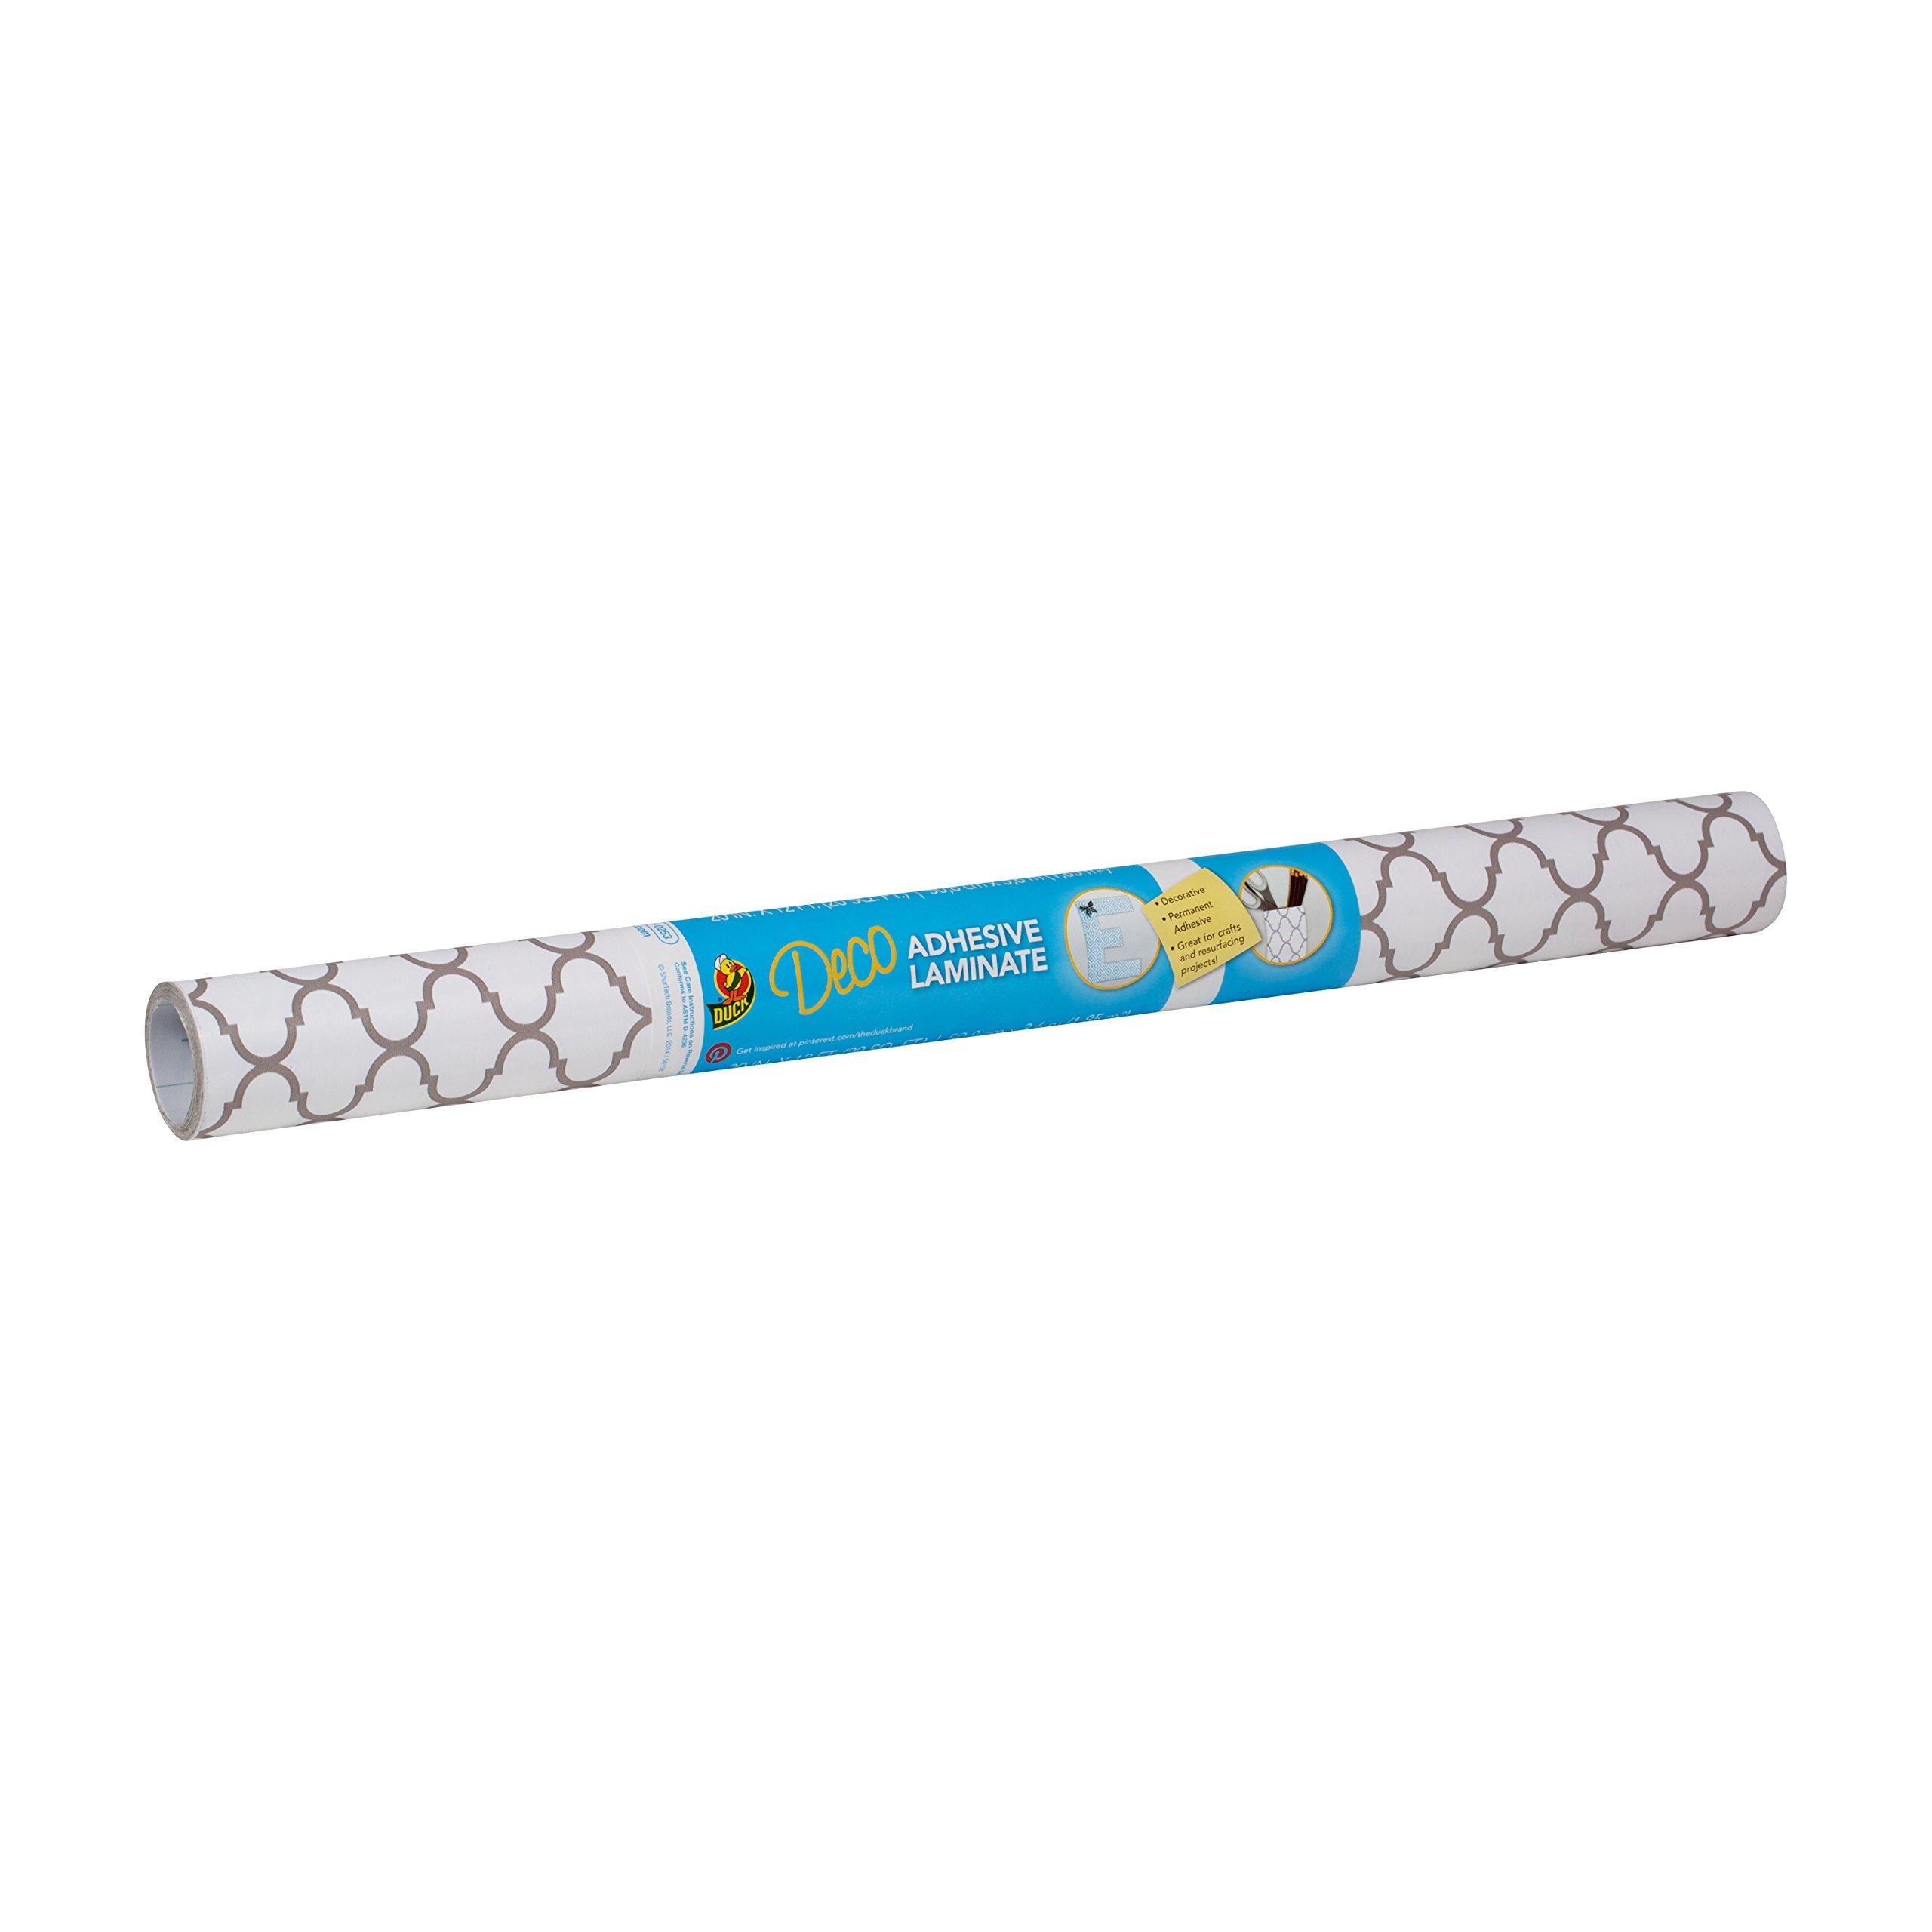 Duck Brand 284136 Deco Adhesive Laminate, 20-Inch x 12-Feet, Taupe Quatrefoil